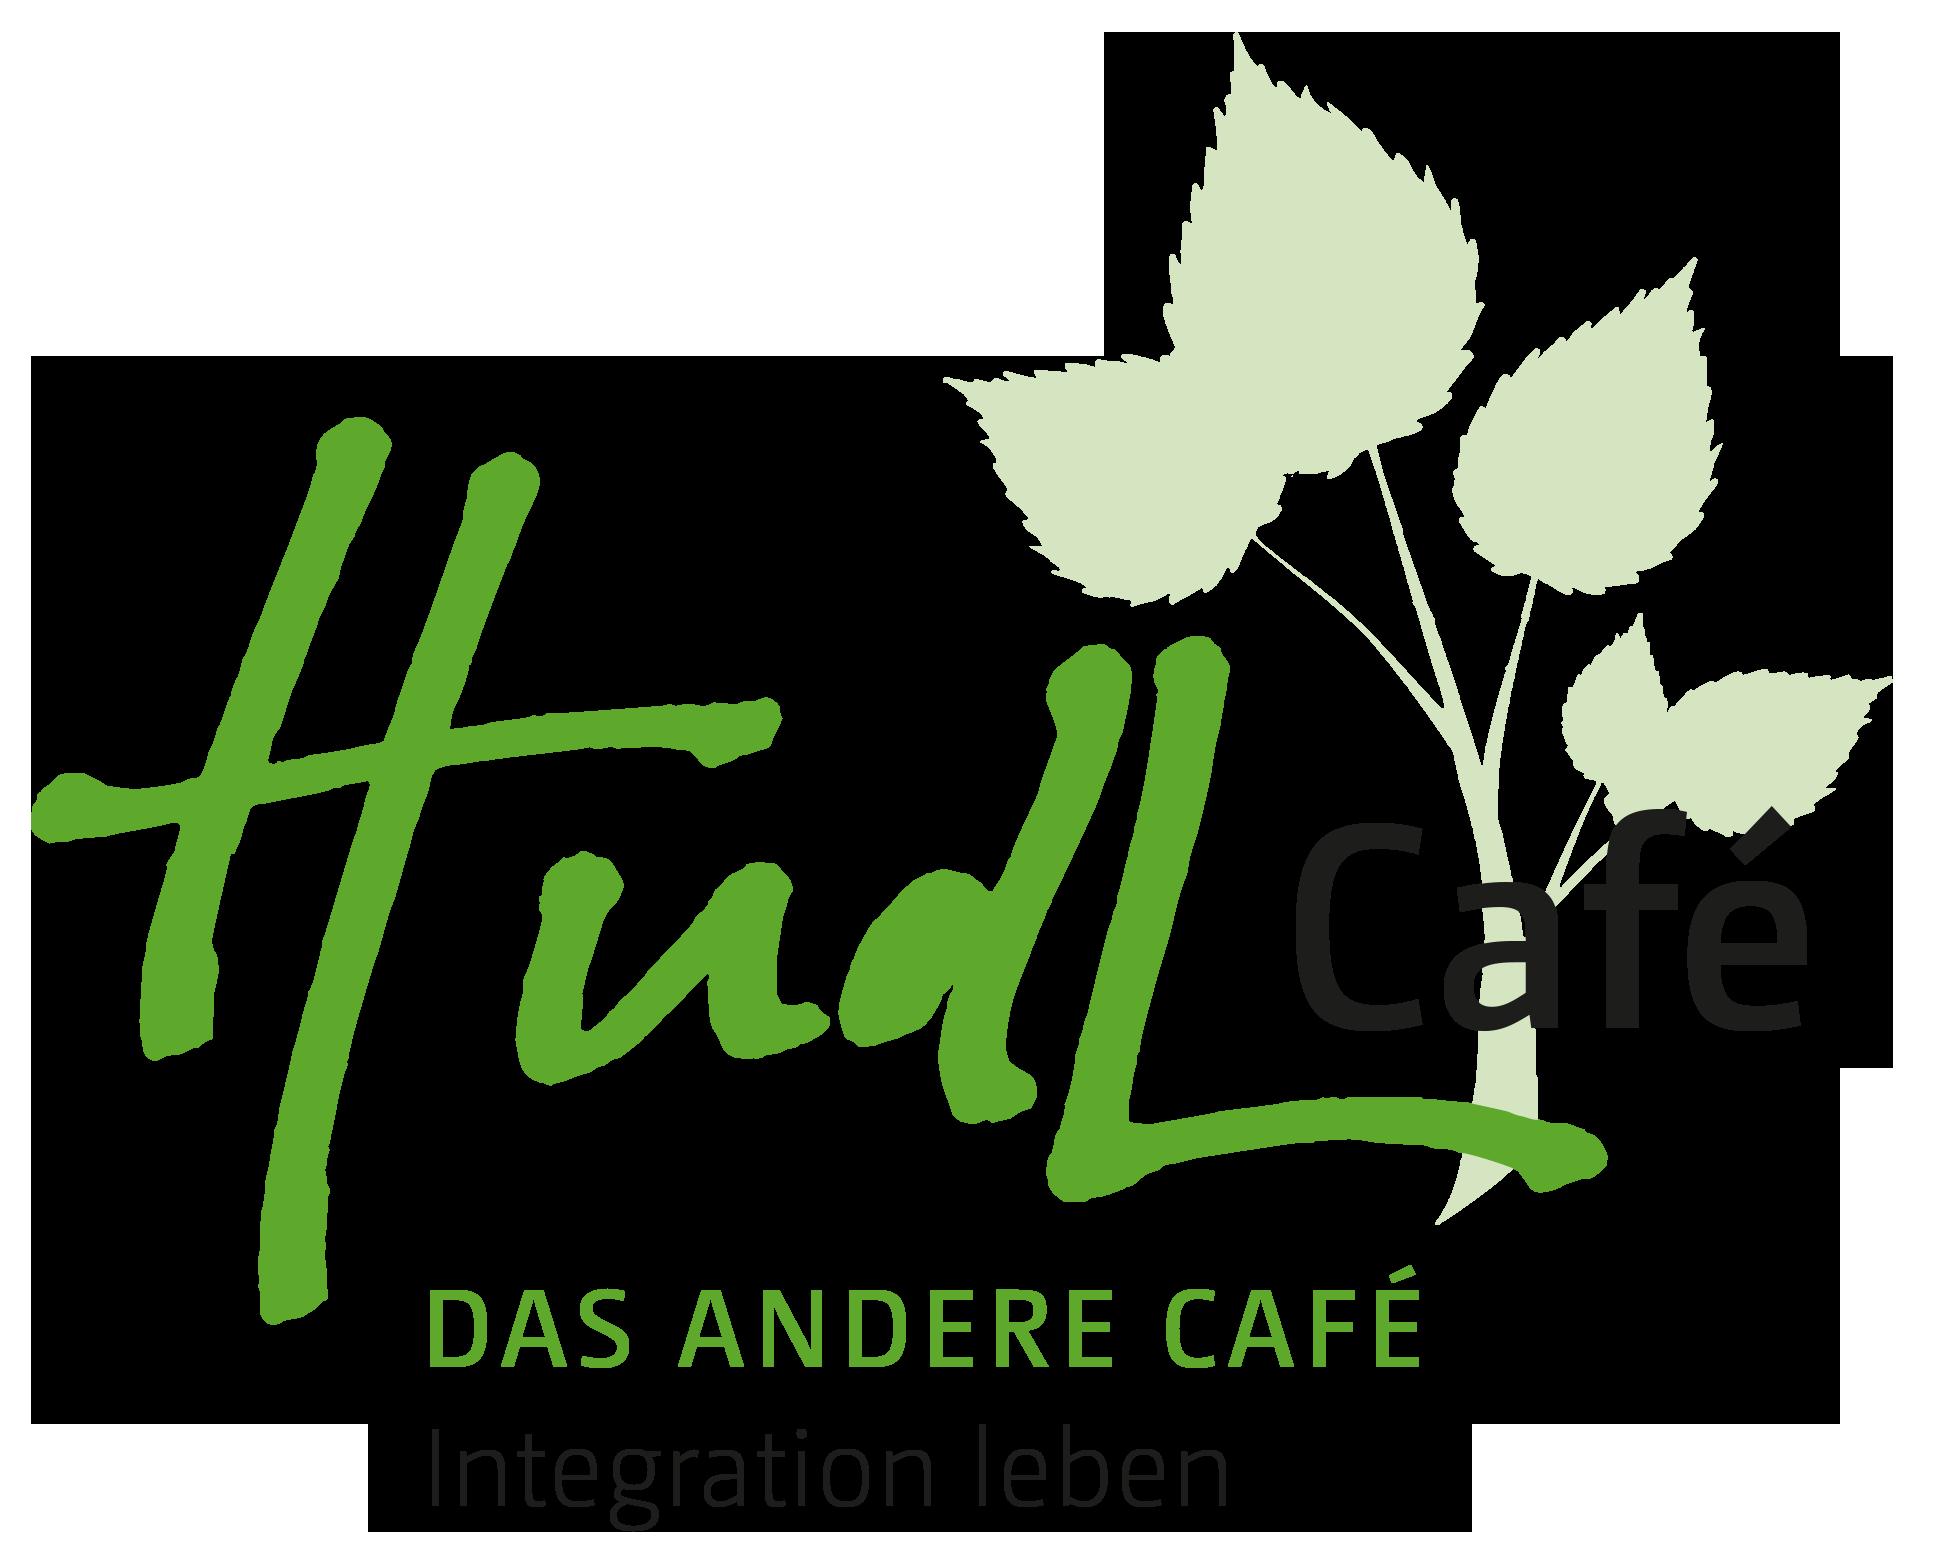 Café HudL